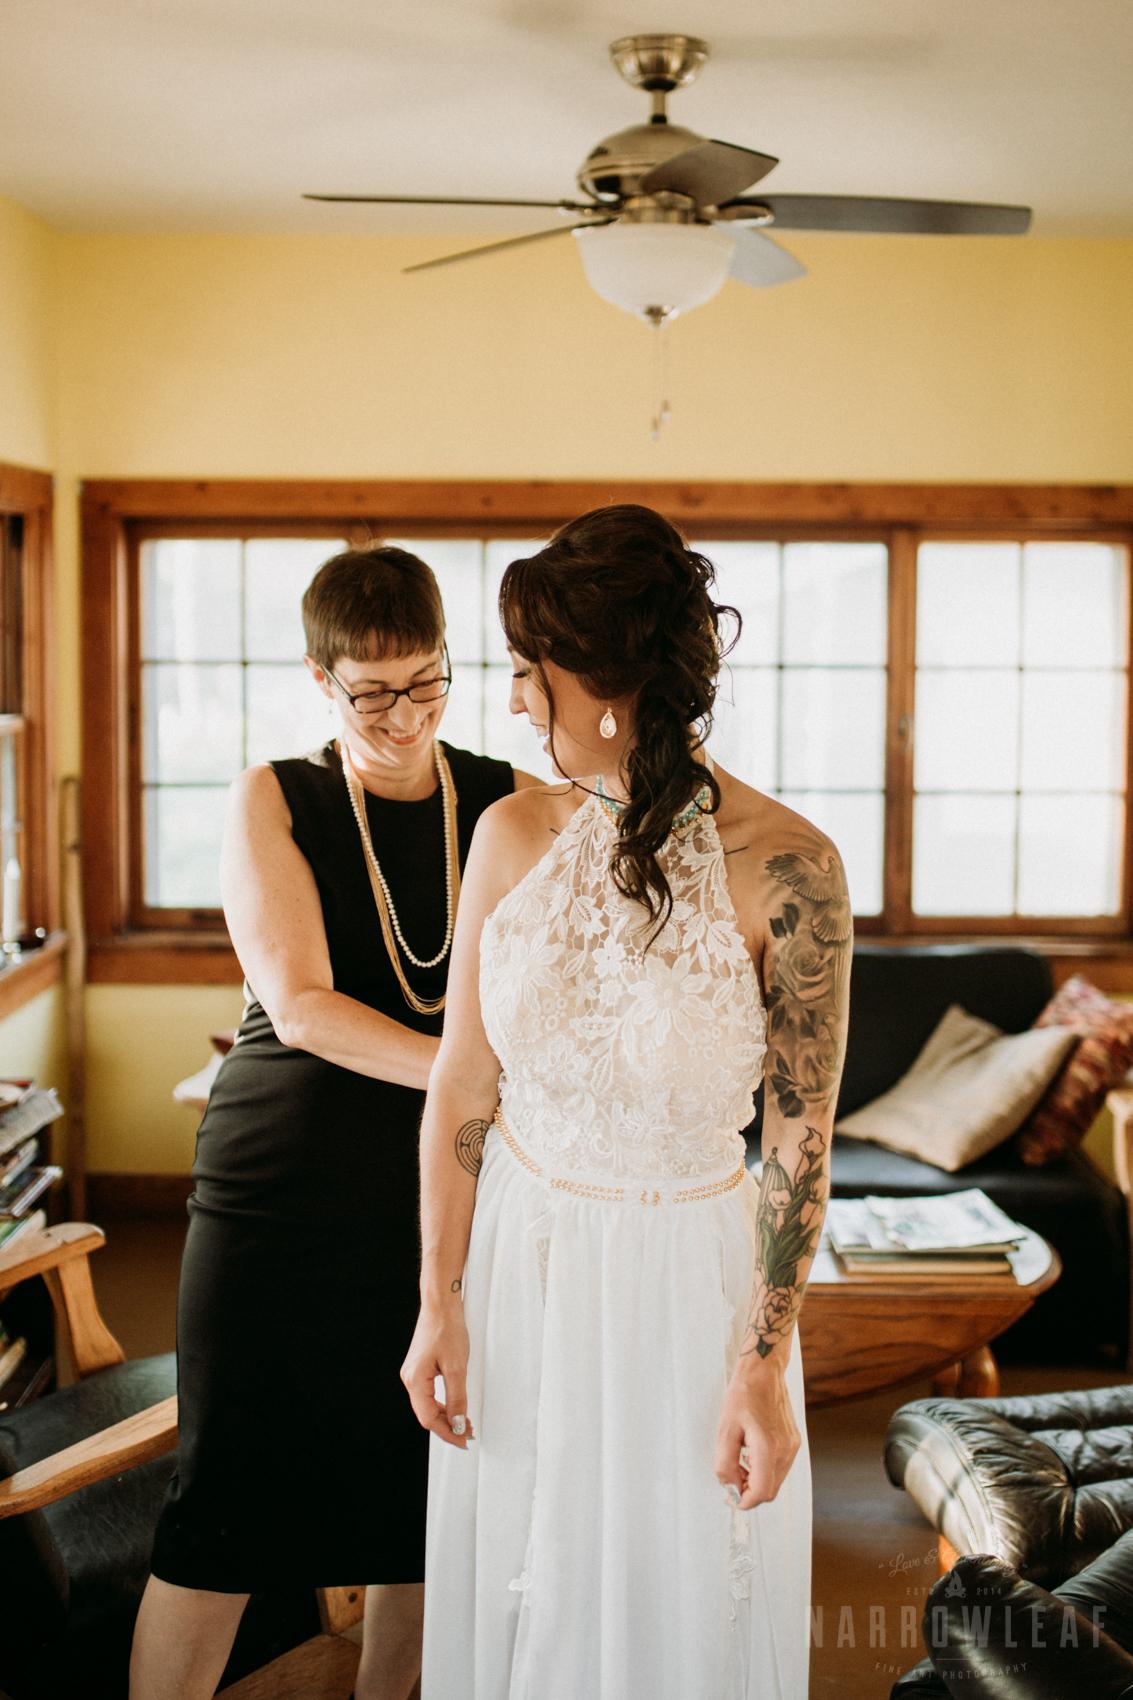 minnesota-outdoor-wedding-elopement-NarrowLeaf_Love_&_Adventure_Photography-4.jpg